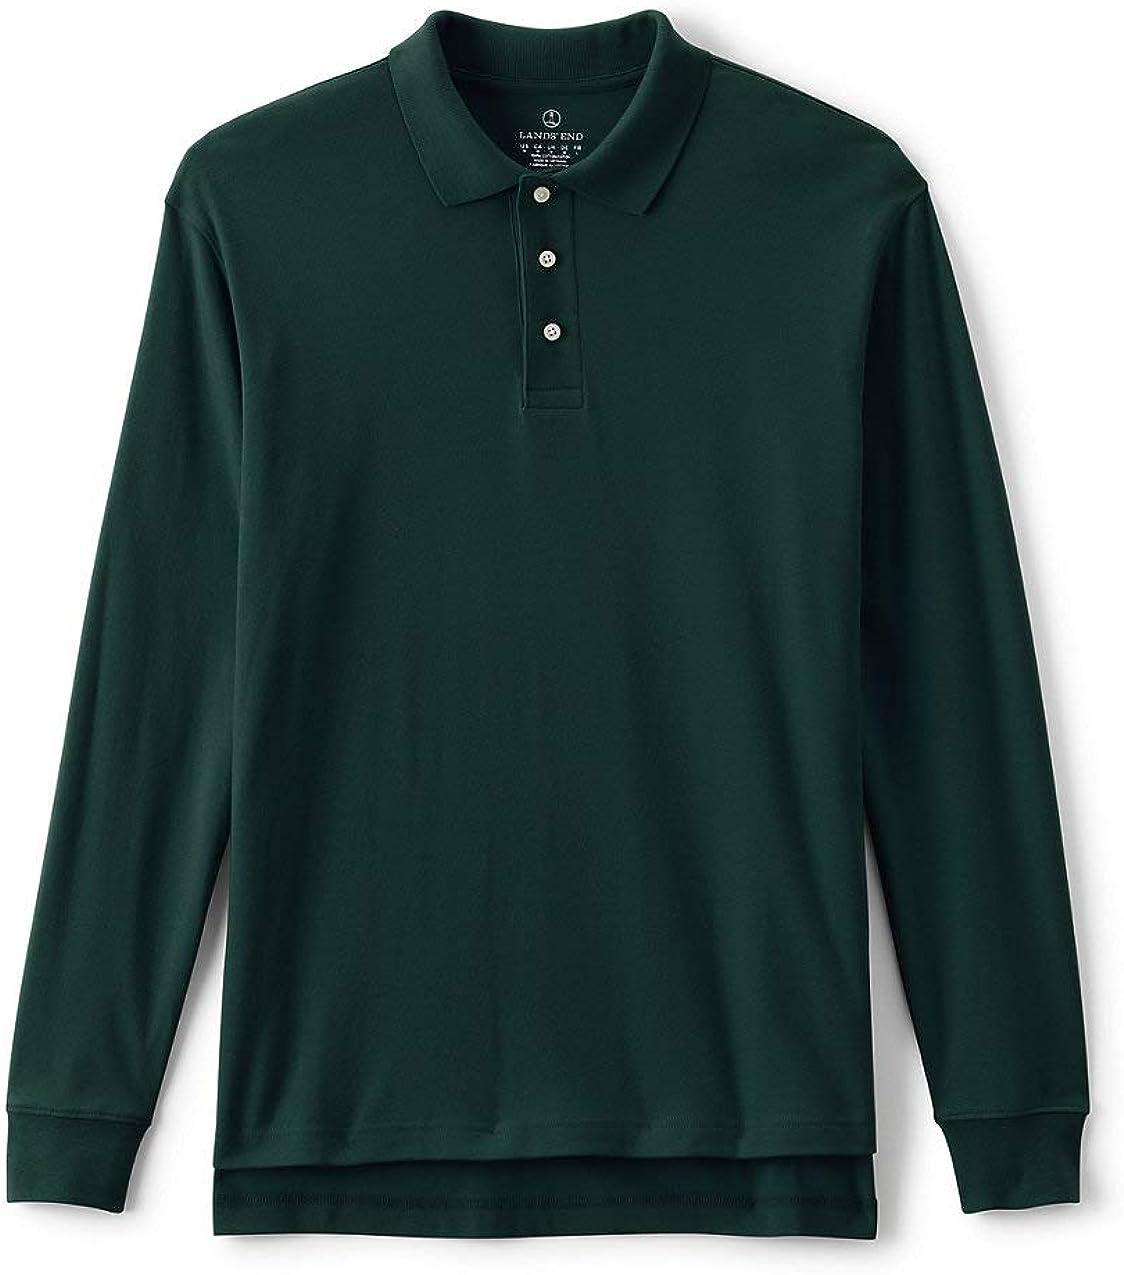 Lands' End School Uniform Men's Long Sleeve Interlock Polo Shirt